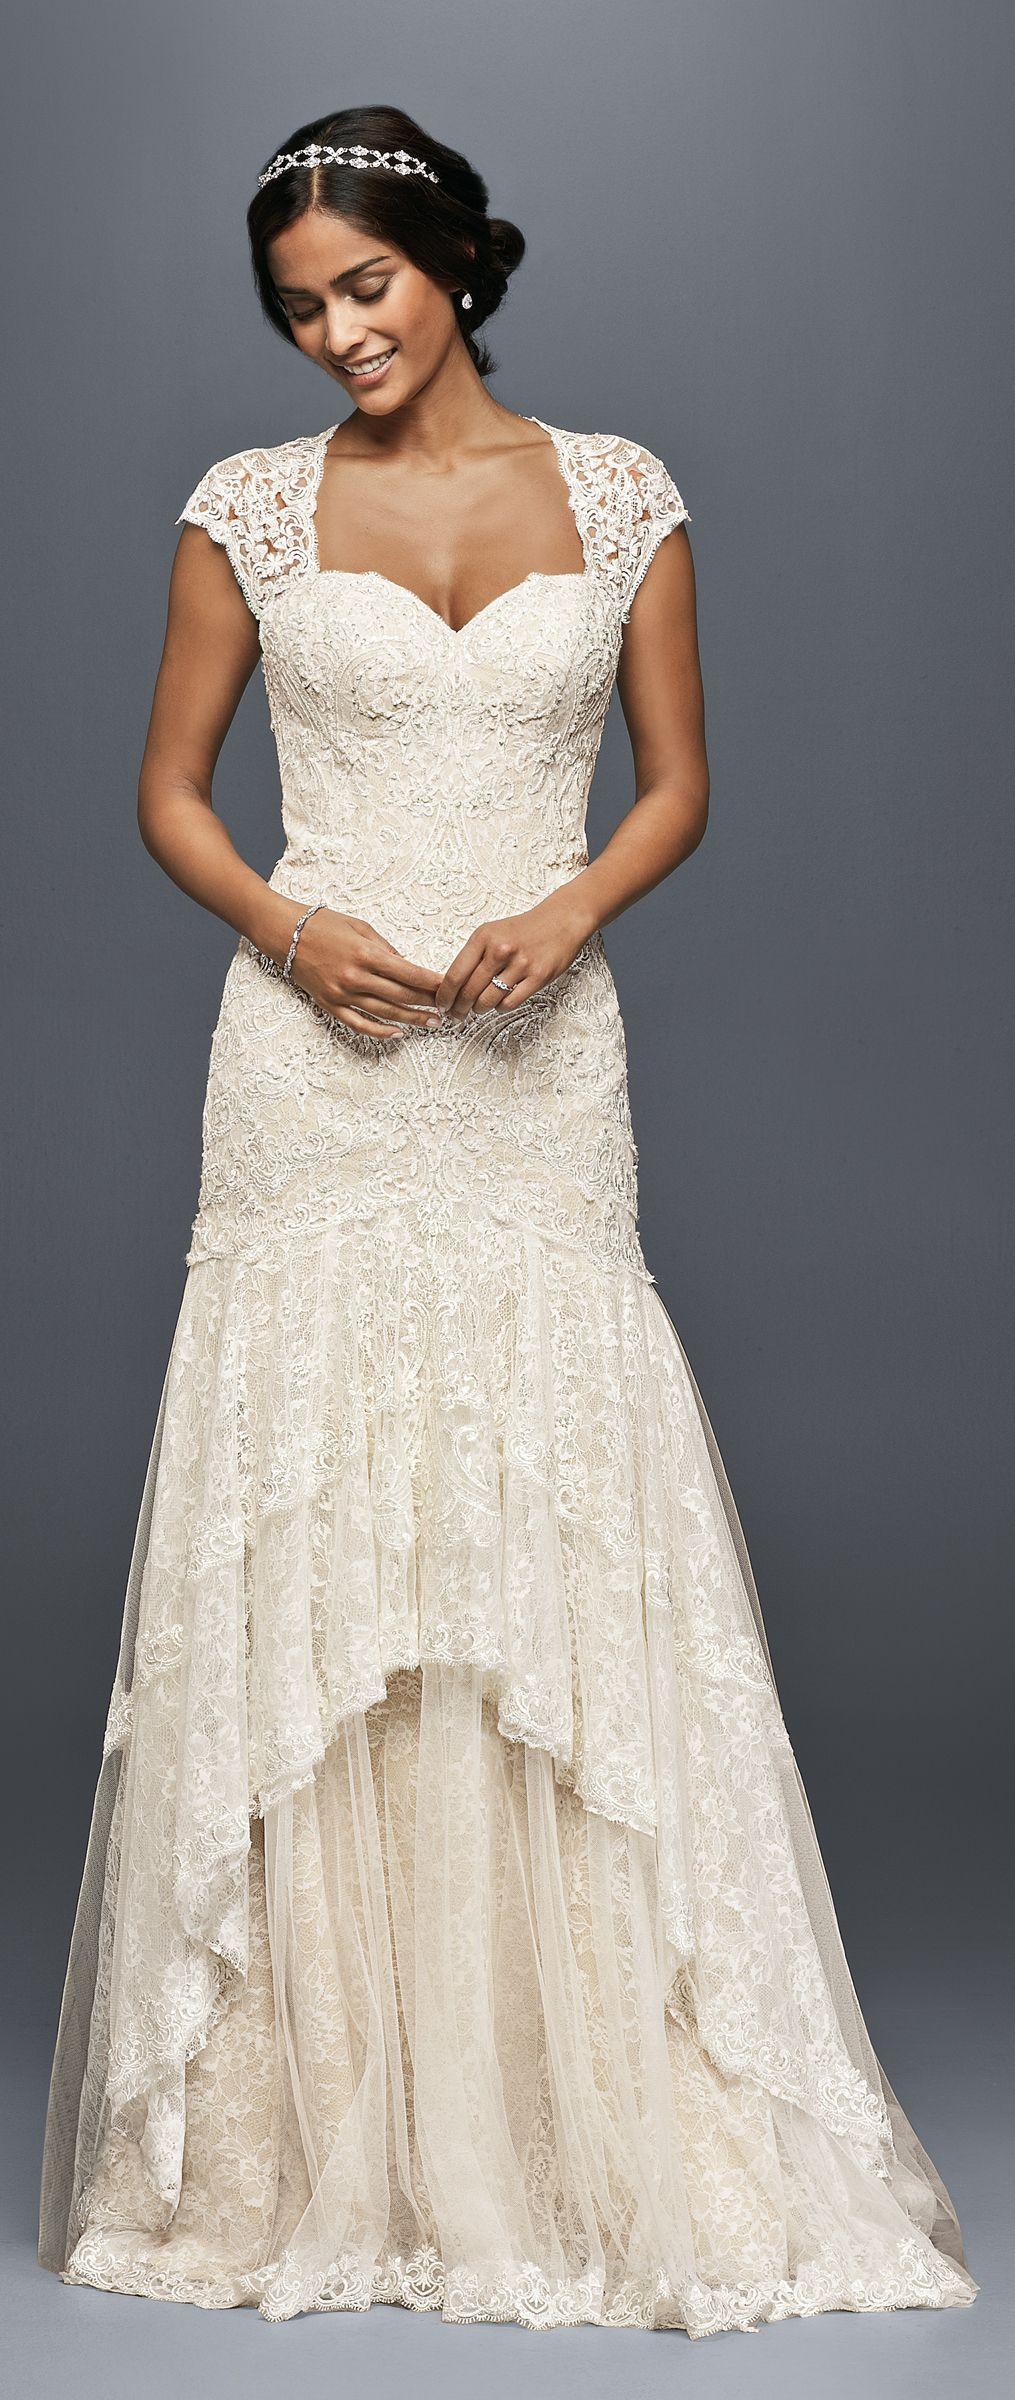 Tiered lace mermaid wedding dress with beading davidus bridal